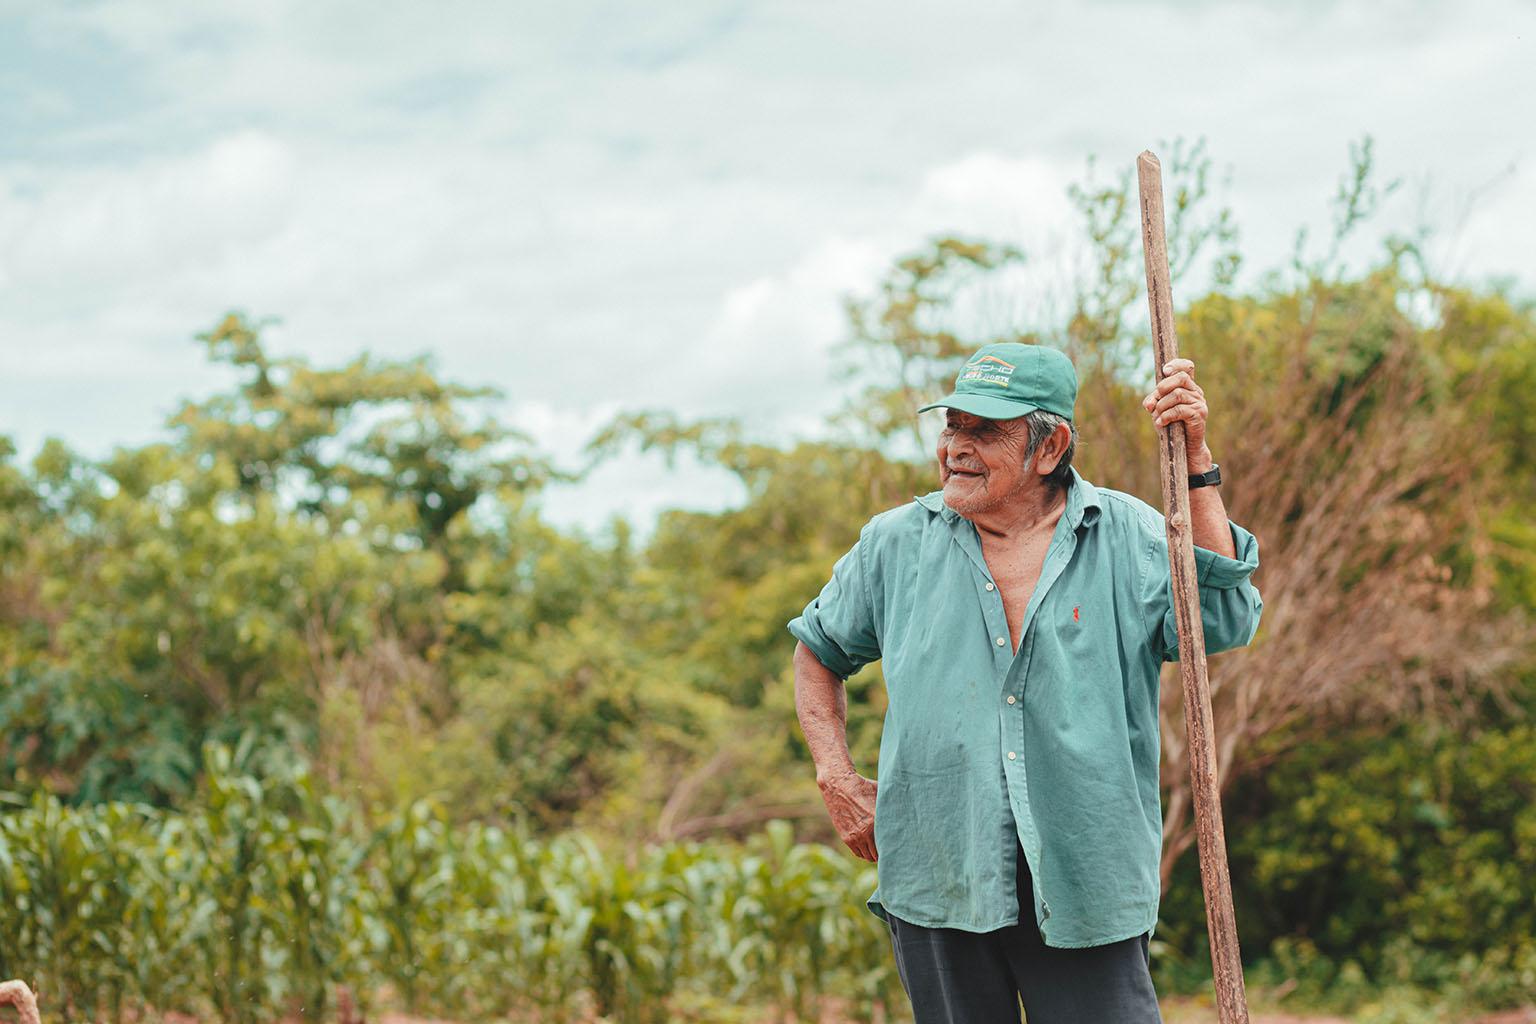 Don Pedro replanting at Peniel, Robore, Bolivia. Photo credit: Adro Mollina